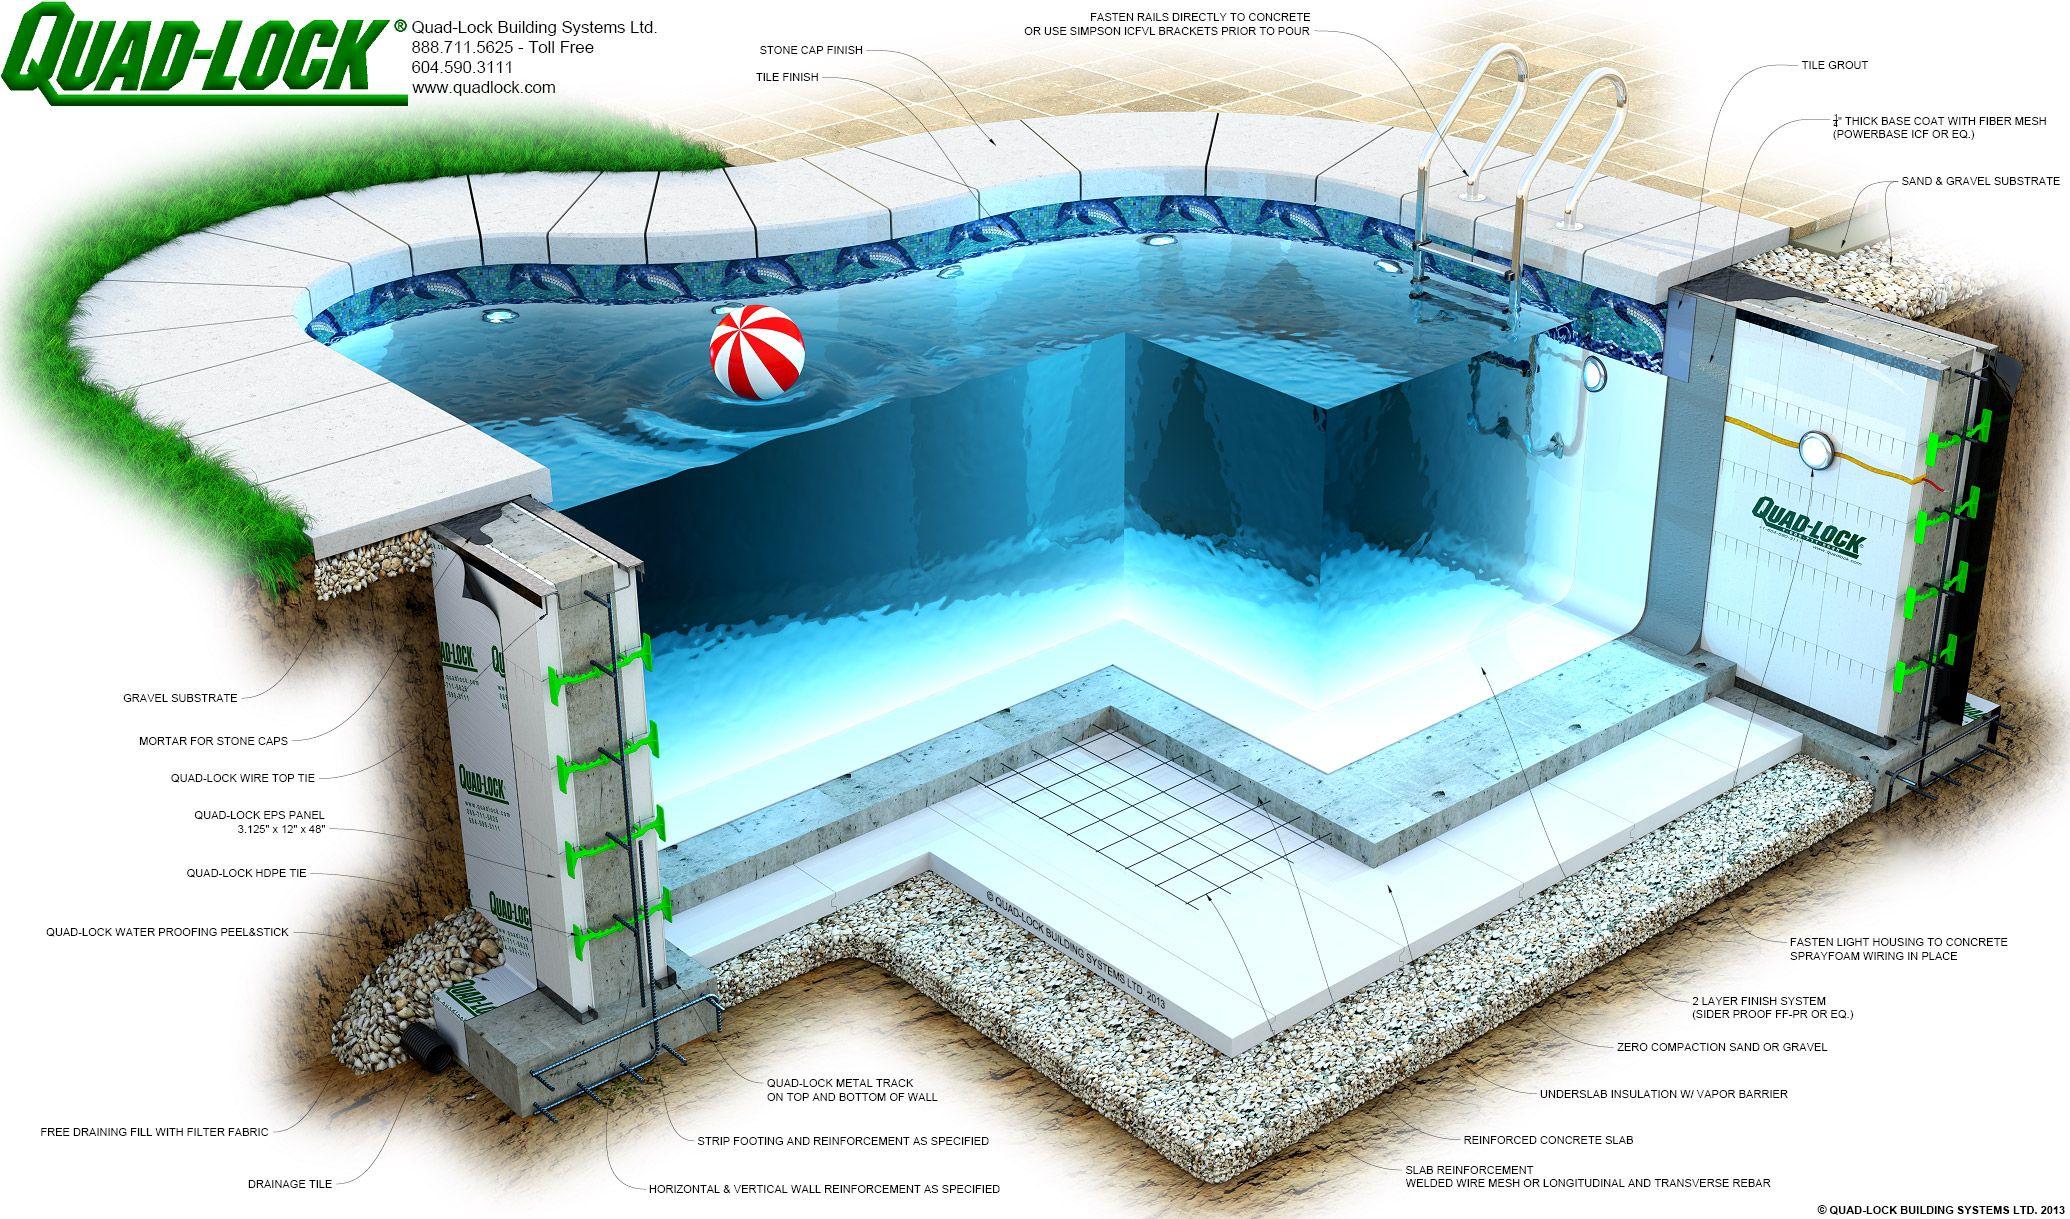 icf pool dream home pinterest pool selber bauen schwimmbecken und pool ideen. Black Bedroom Furniture Sets. Home Design Ideas